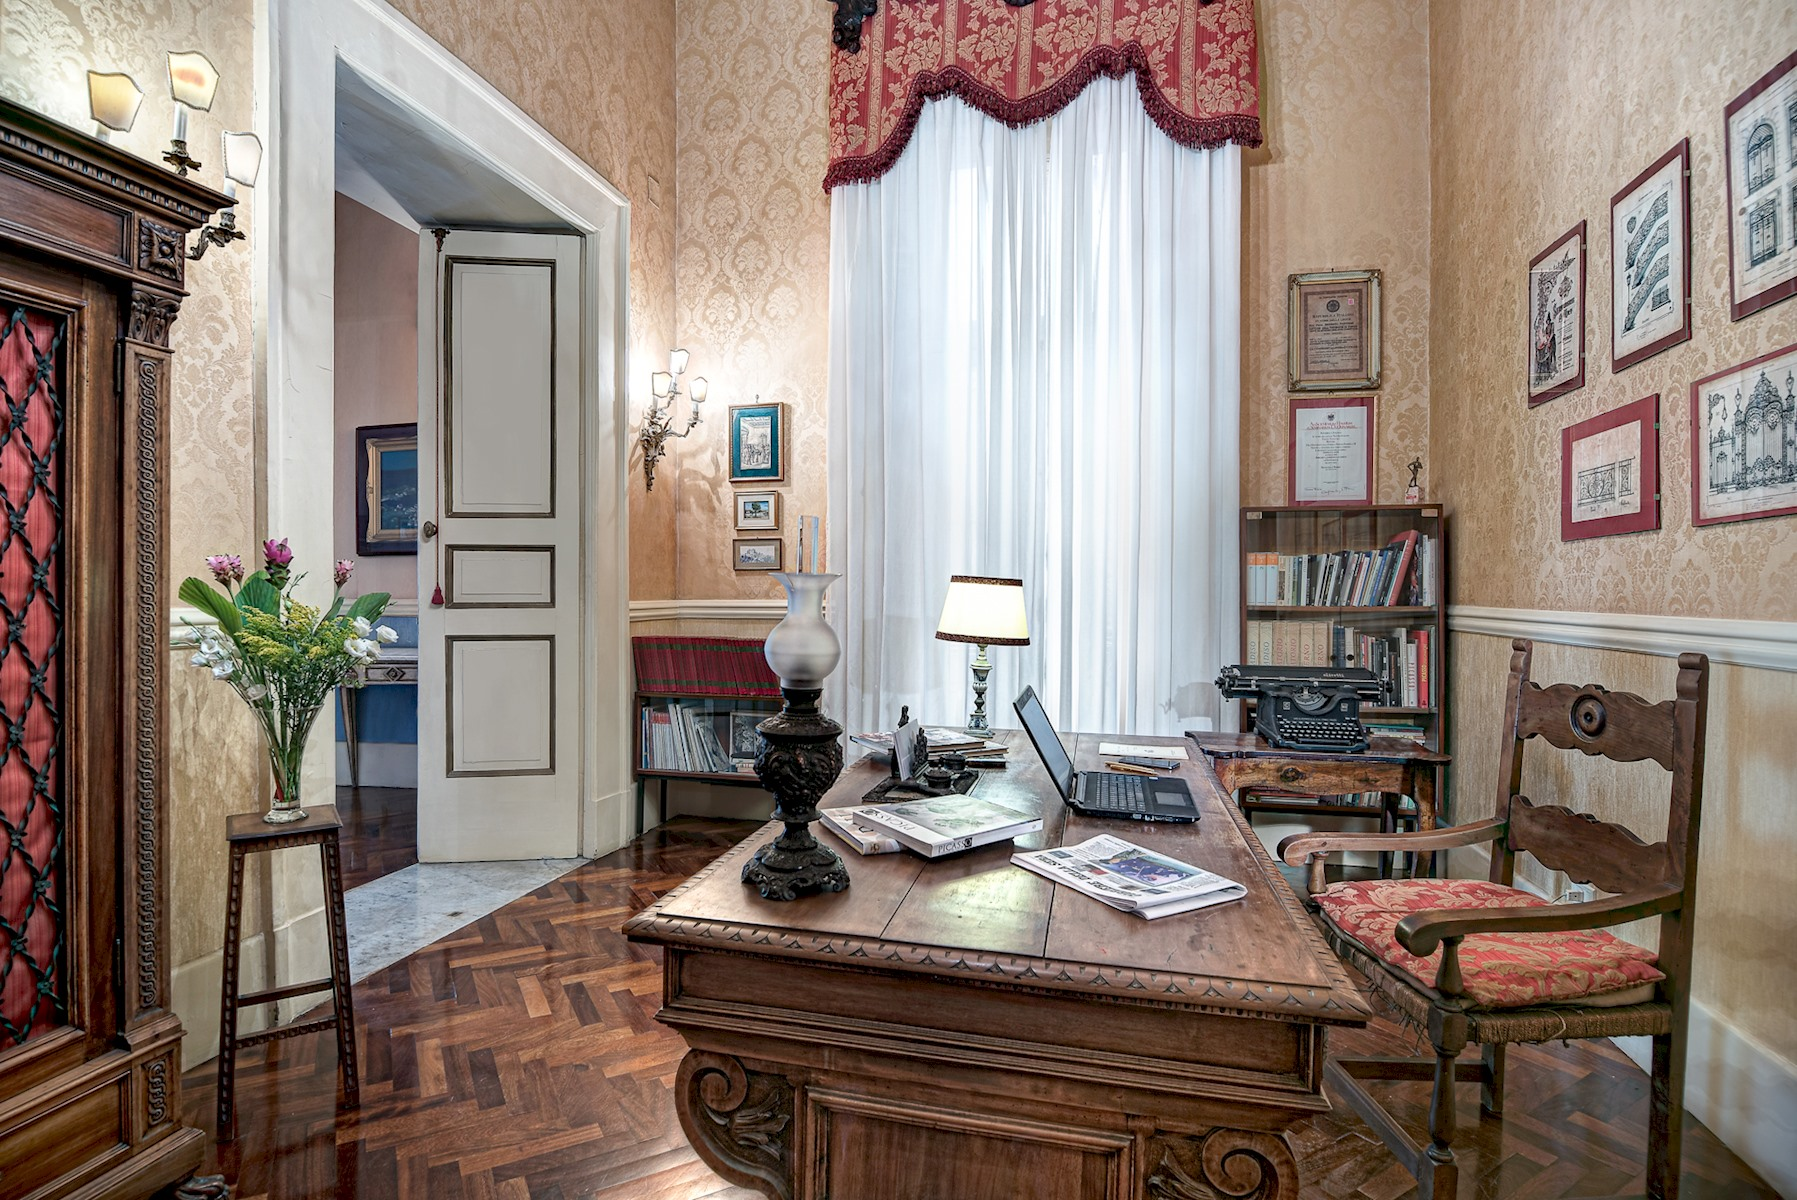 Apartment Arthouse - Lady Mary s Tribunali Luxury Suite - Naples Historical Centre photo 19245030